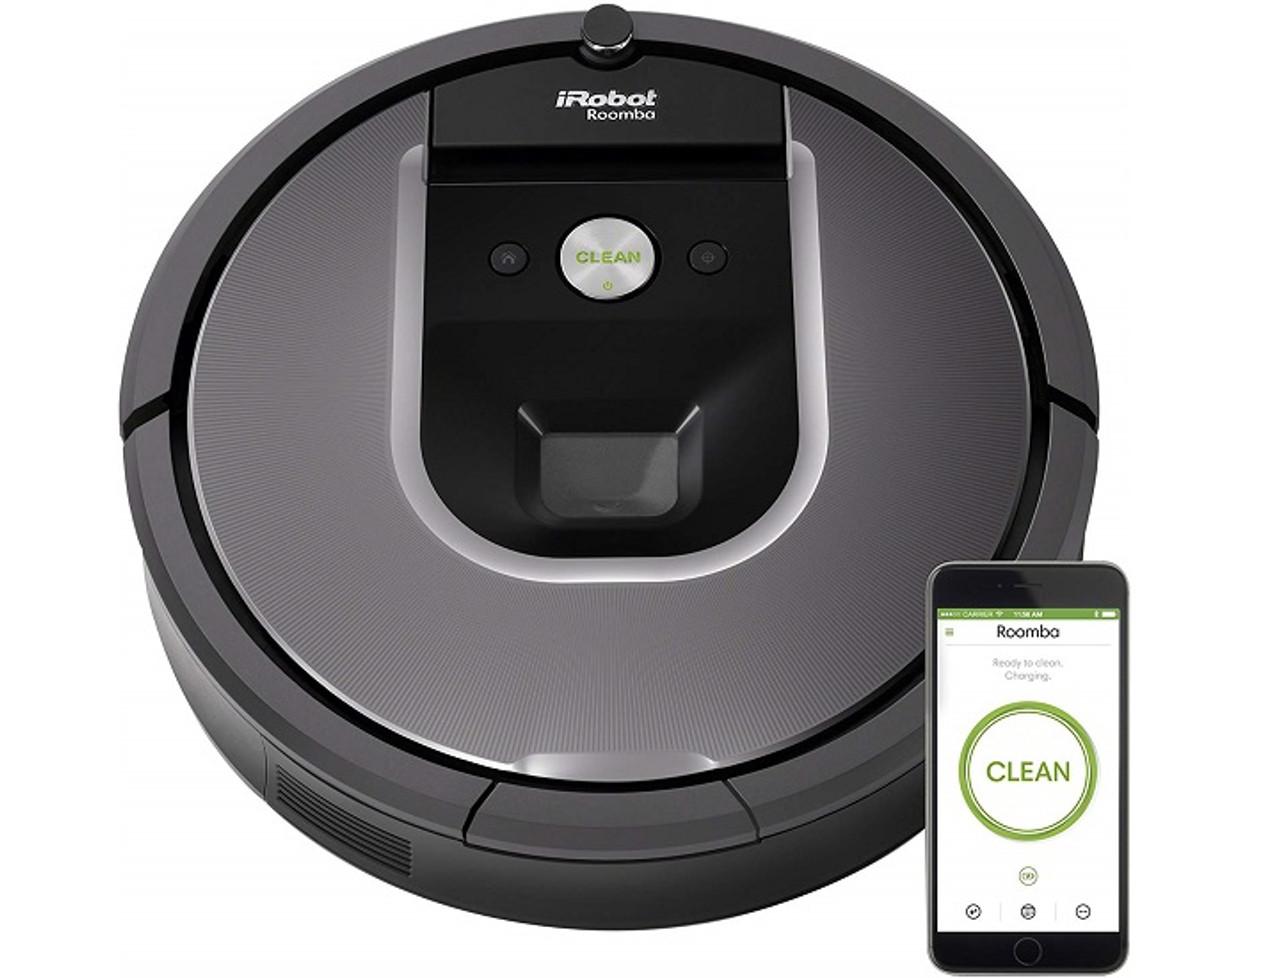 iRobot Roomba 960 Smart Robot Vacuum with Auto-Charging Dock $289.99 (59% OFF)